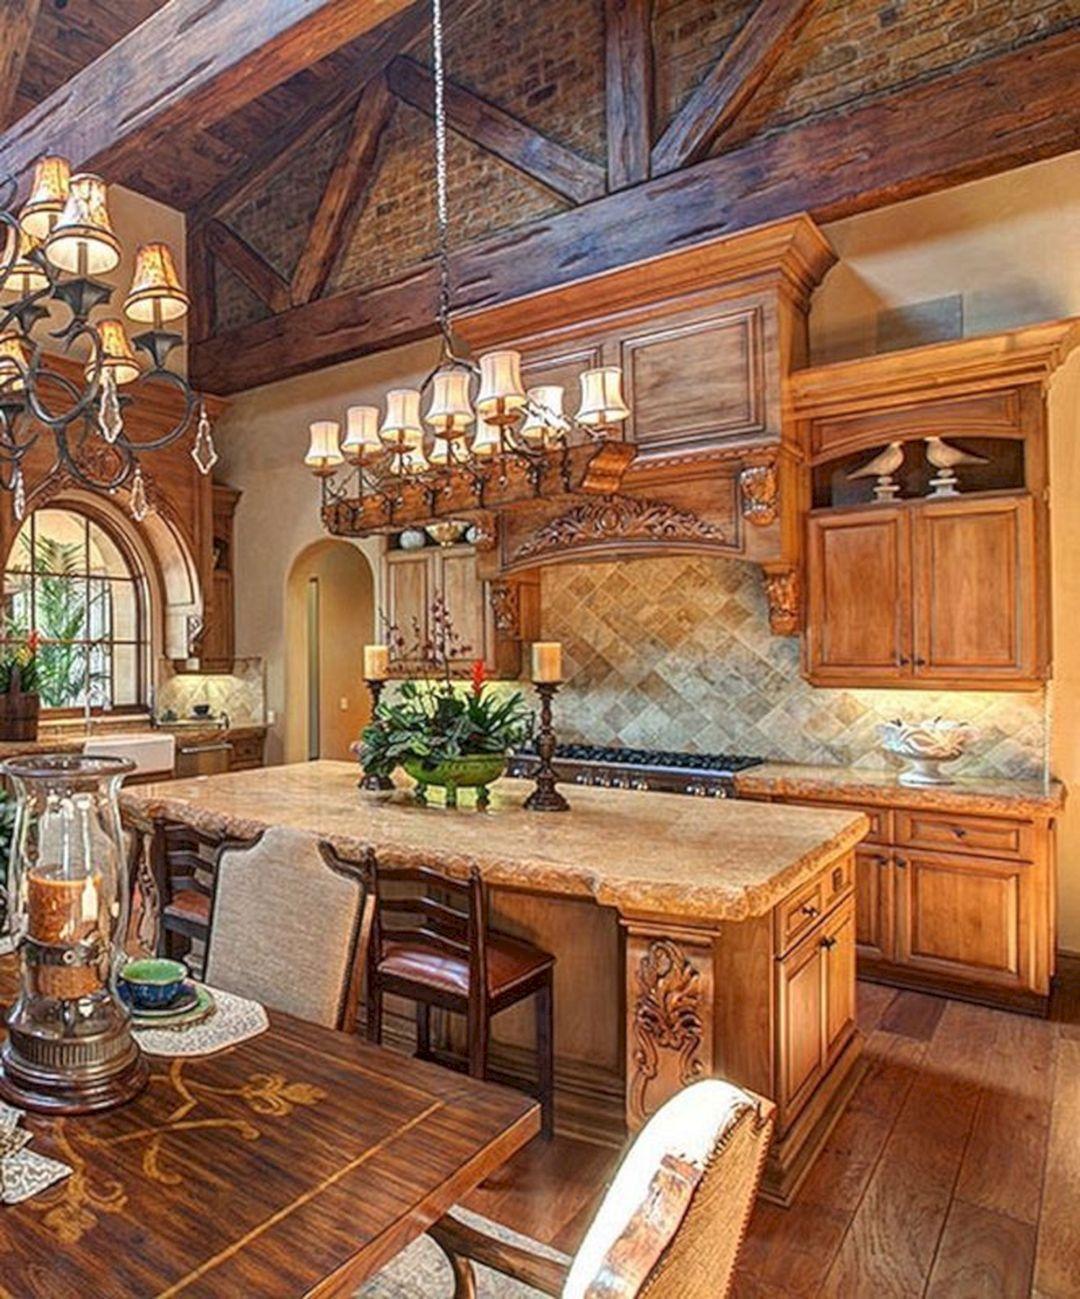 21 Marvelous Rustic Italian Decorating For Stunning Rustic Home Ideas Freshouz Com Tuscan Kitchen Design Italian Kitchen Design Rustic Italian Home